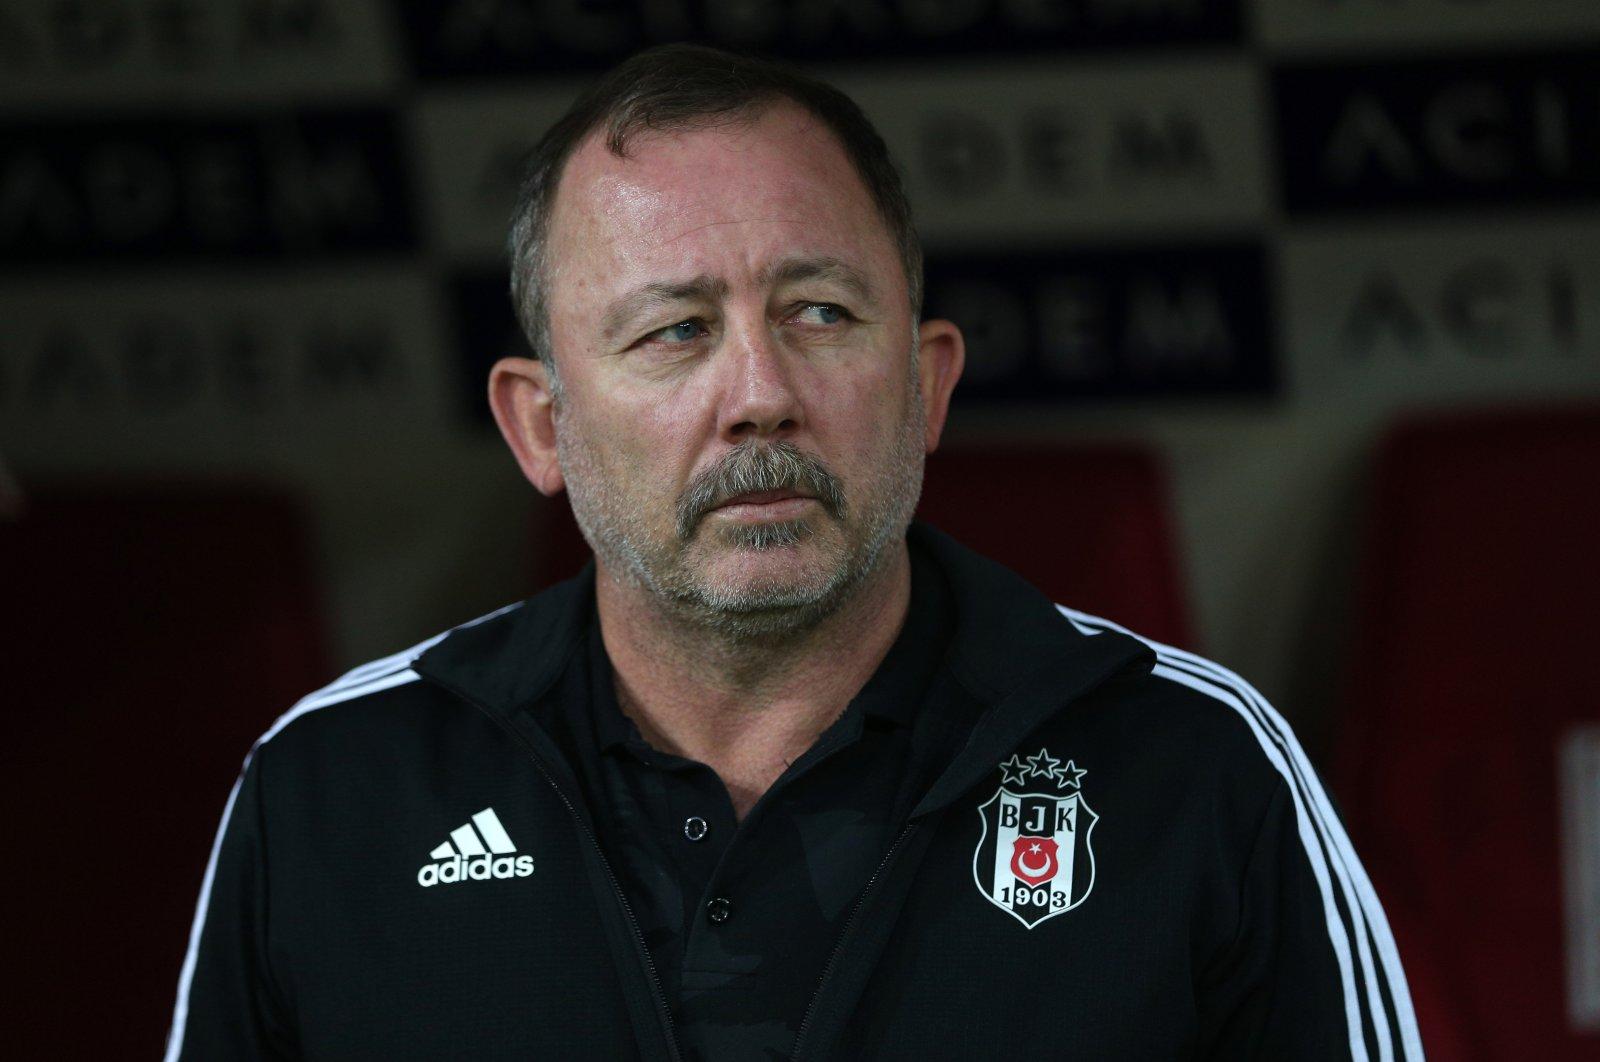 Beşiktaş coach Sergen Yalçın during a Süper Lig match against Kayserispor, in Kayseri, Turkey, July 6, 2020. (AA Photo)